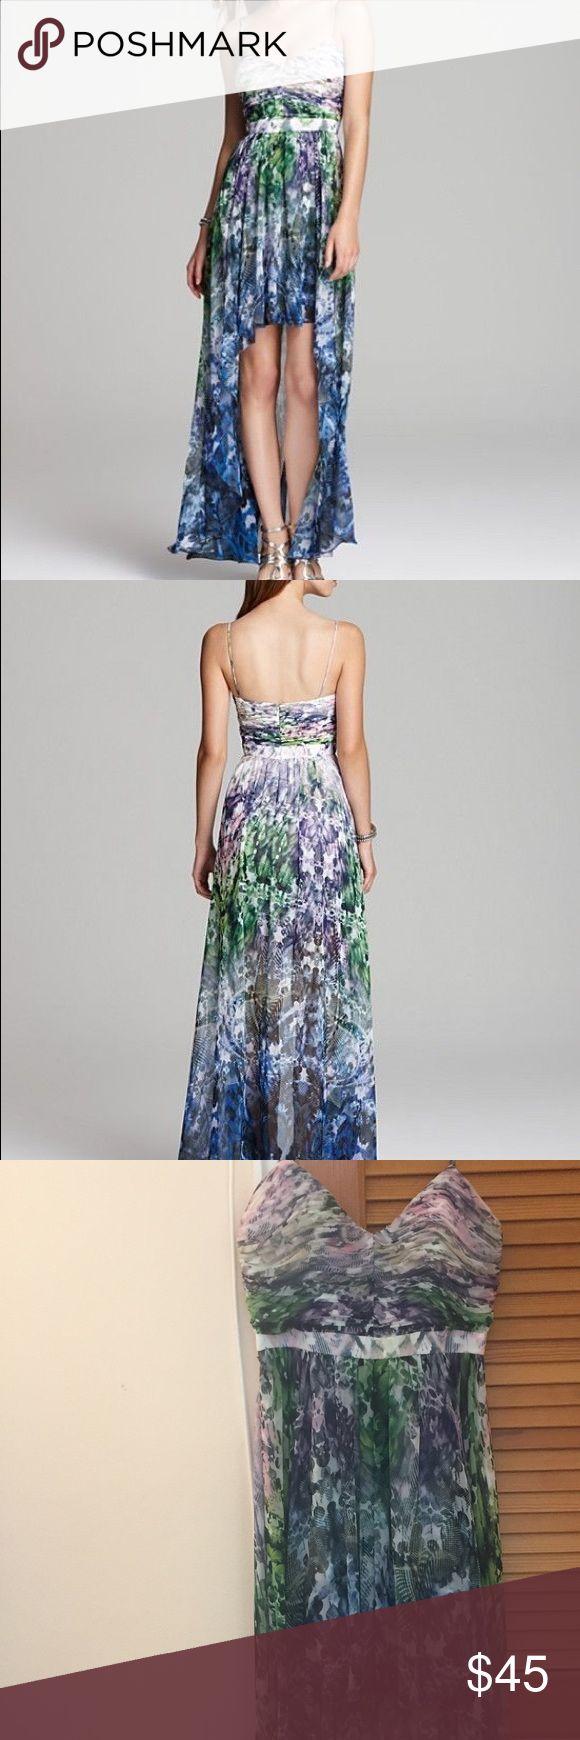 Aidan Mattox High Low printed Dress Worn twice.  Size 6 Aidan Mattox Dresses High Low